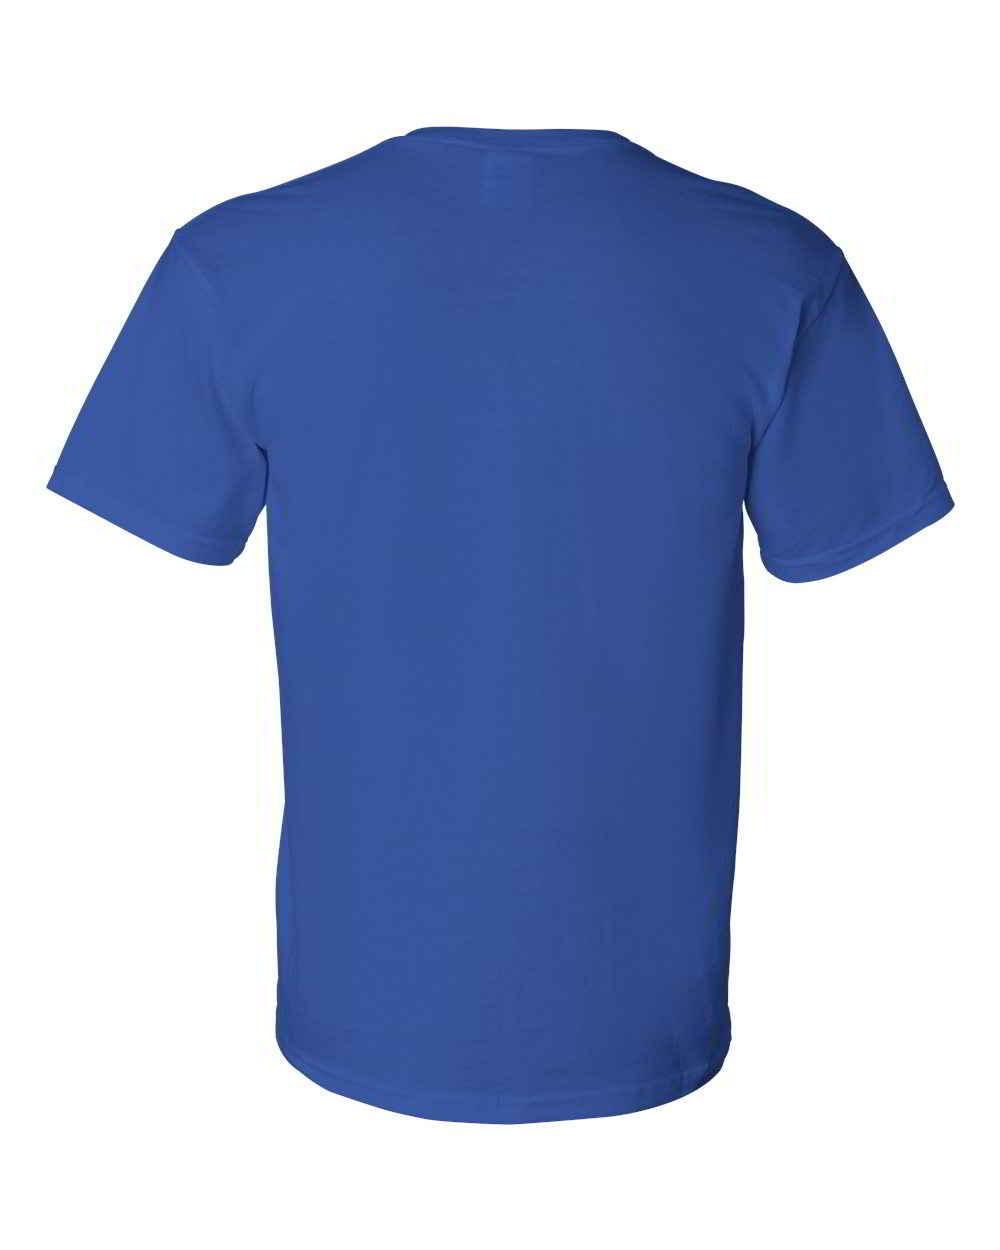 Gildan-DryBlend-Mens-50-50-Short-Sleeve-Tees-T-Shirt-with-a-Pocket thumbnail 12